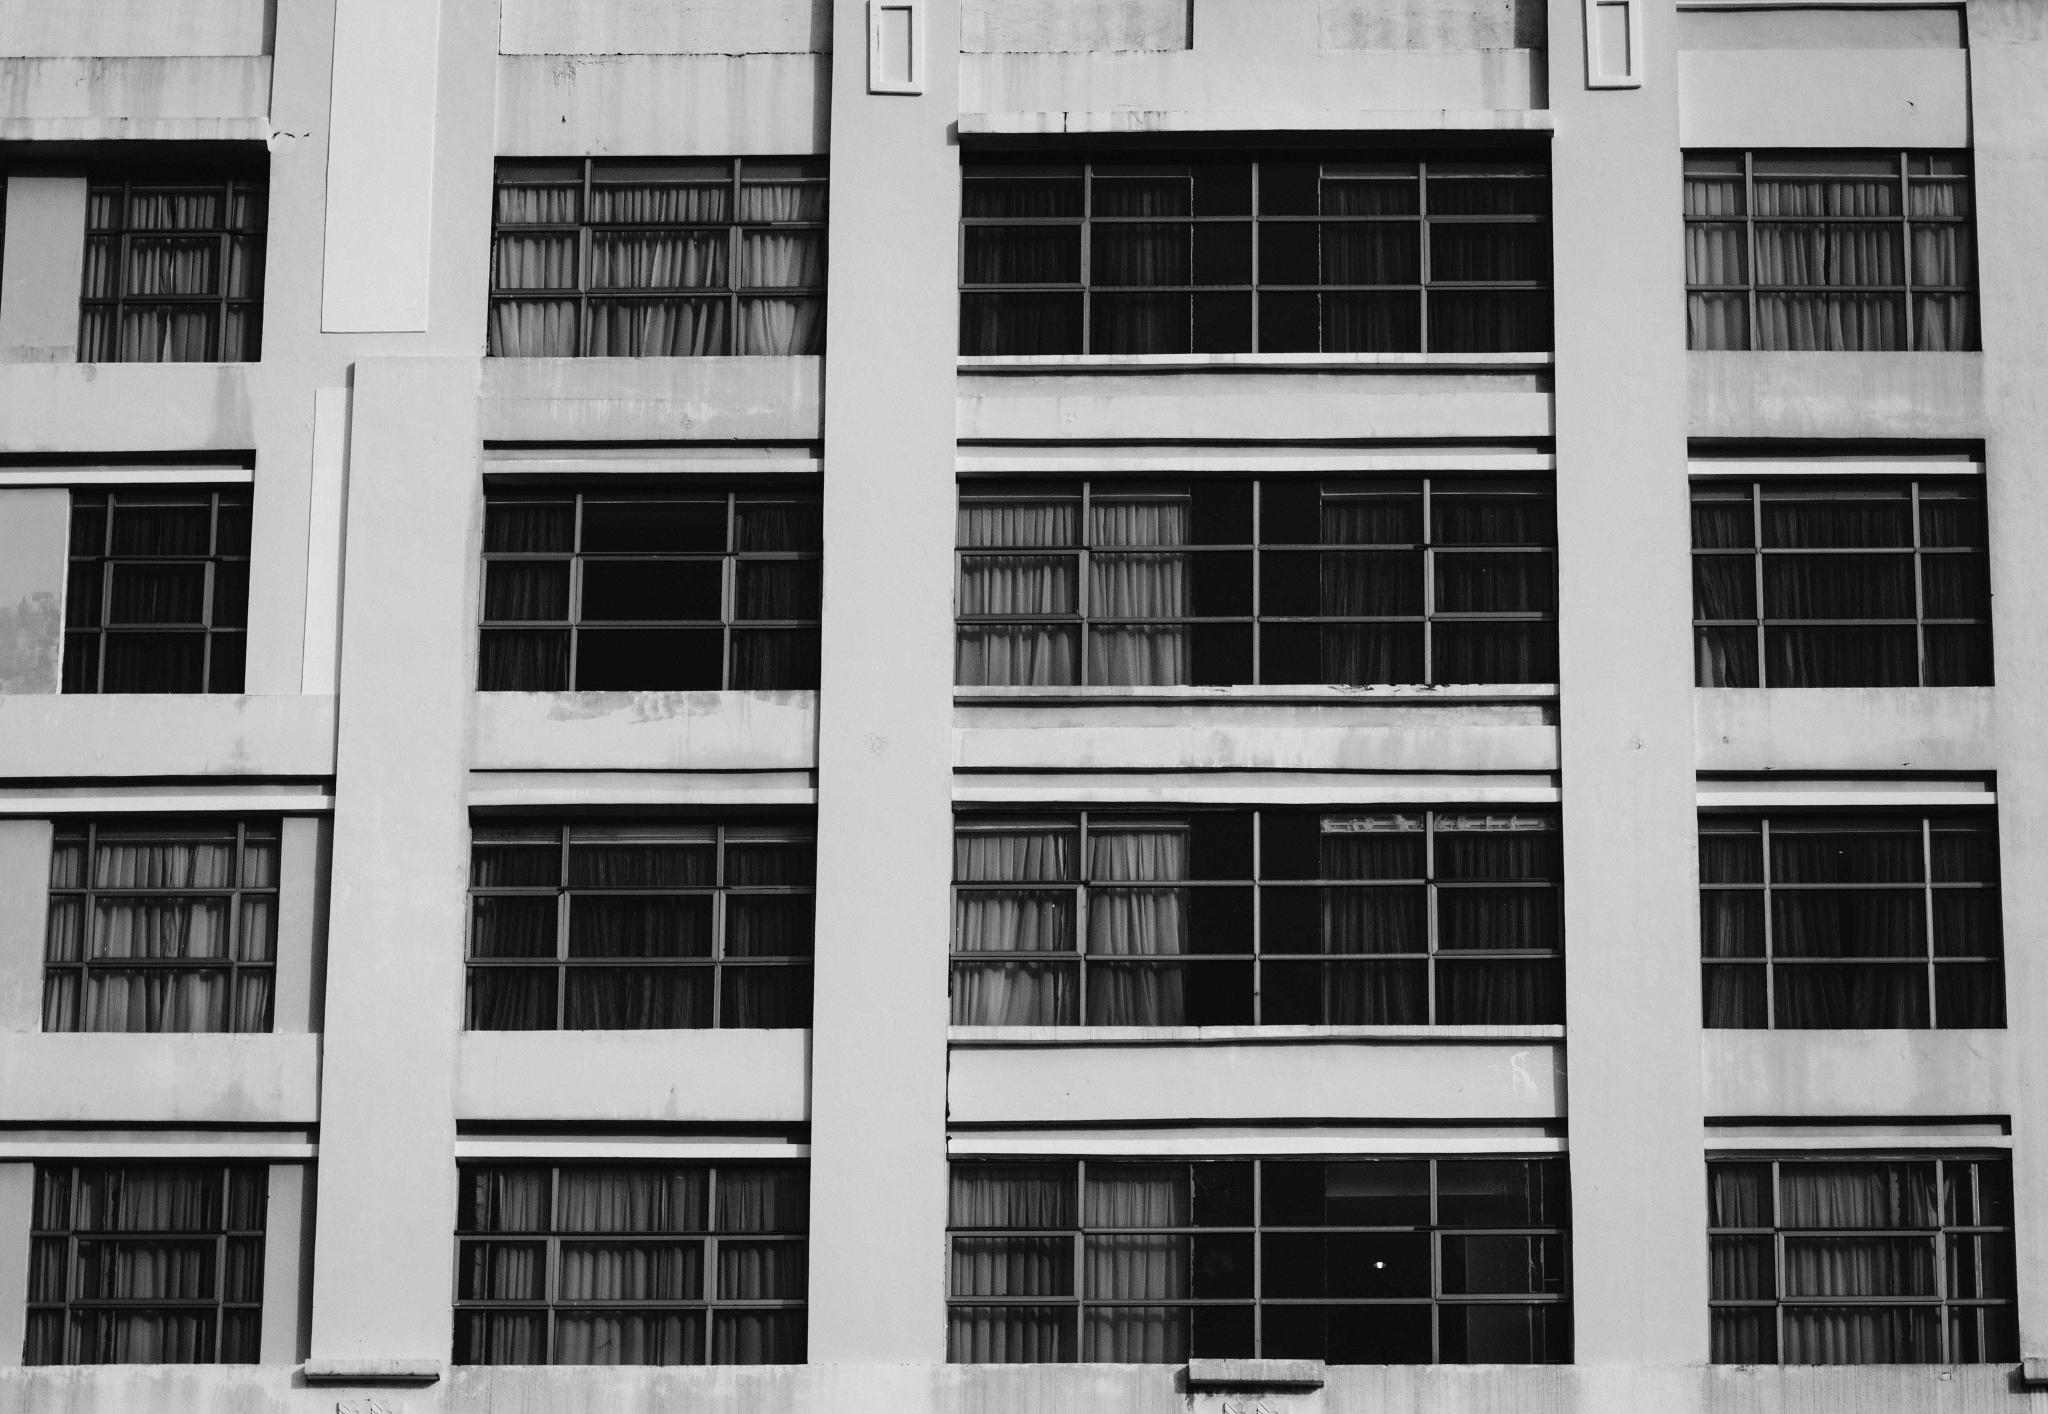 Window grille kota kinabalu -  The Klagan Hotel Was Built In 2012